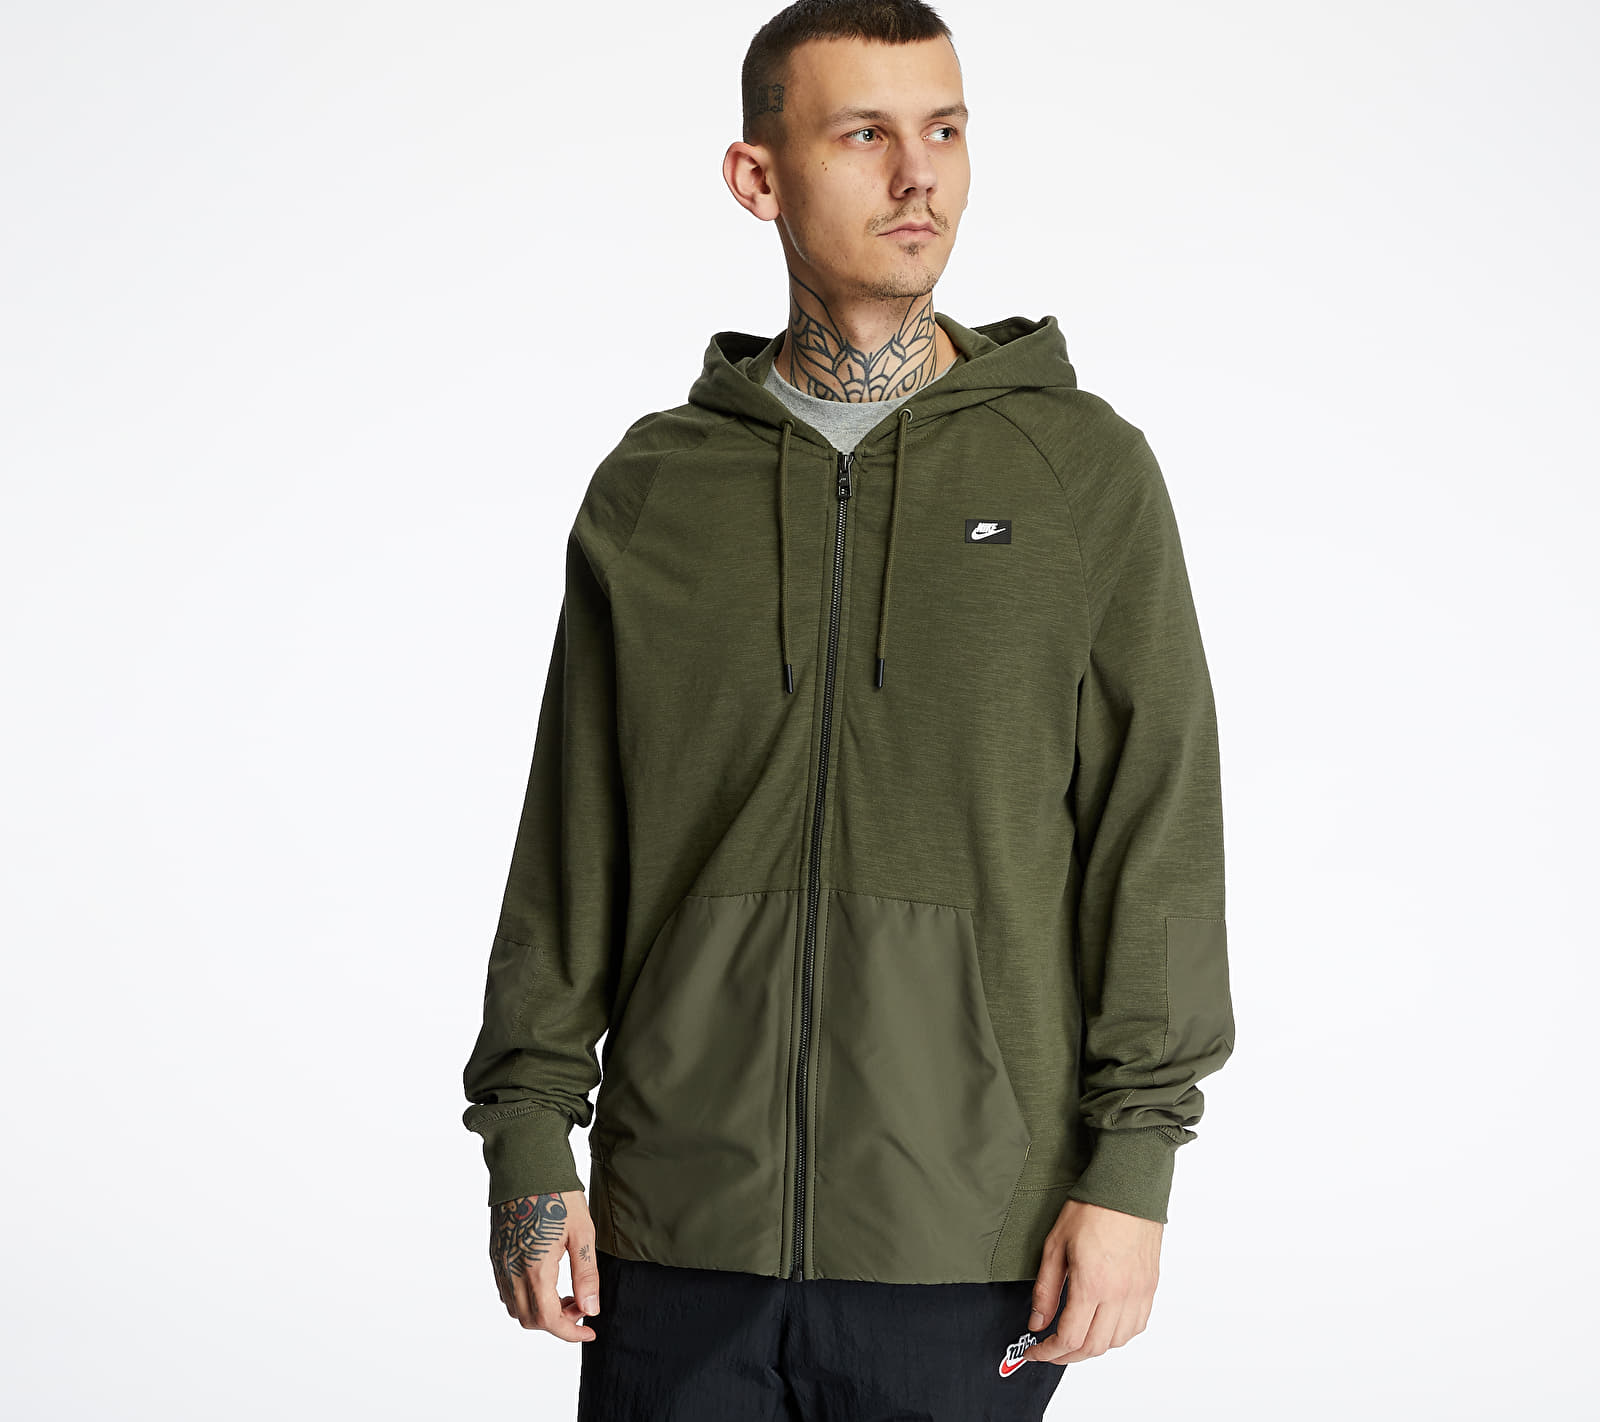 Nike Sportswear Me LTWT Mix Hoodie Cargo Khaki/ Cargo Khaki/ Black Oxidized, Green